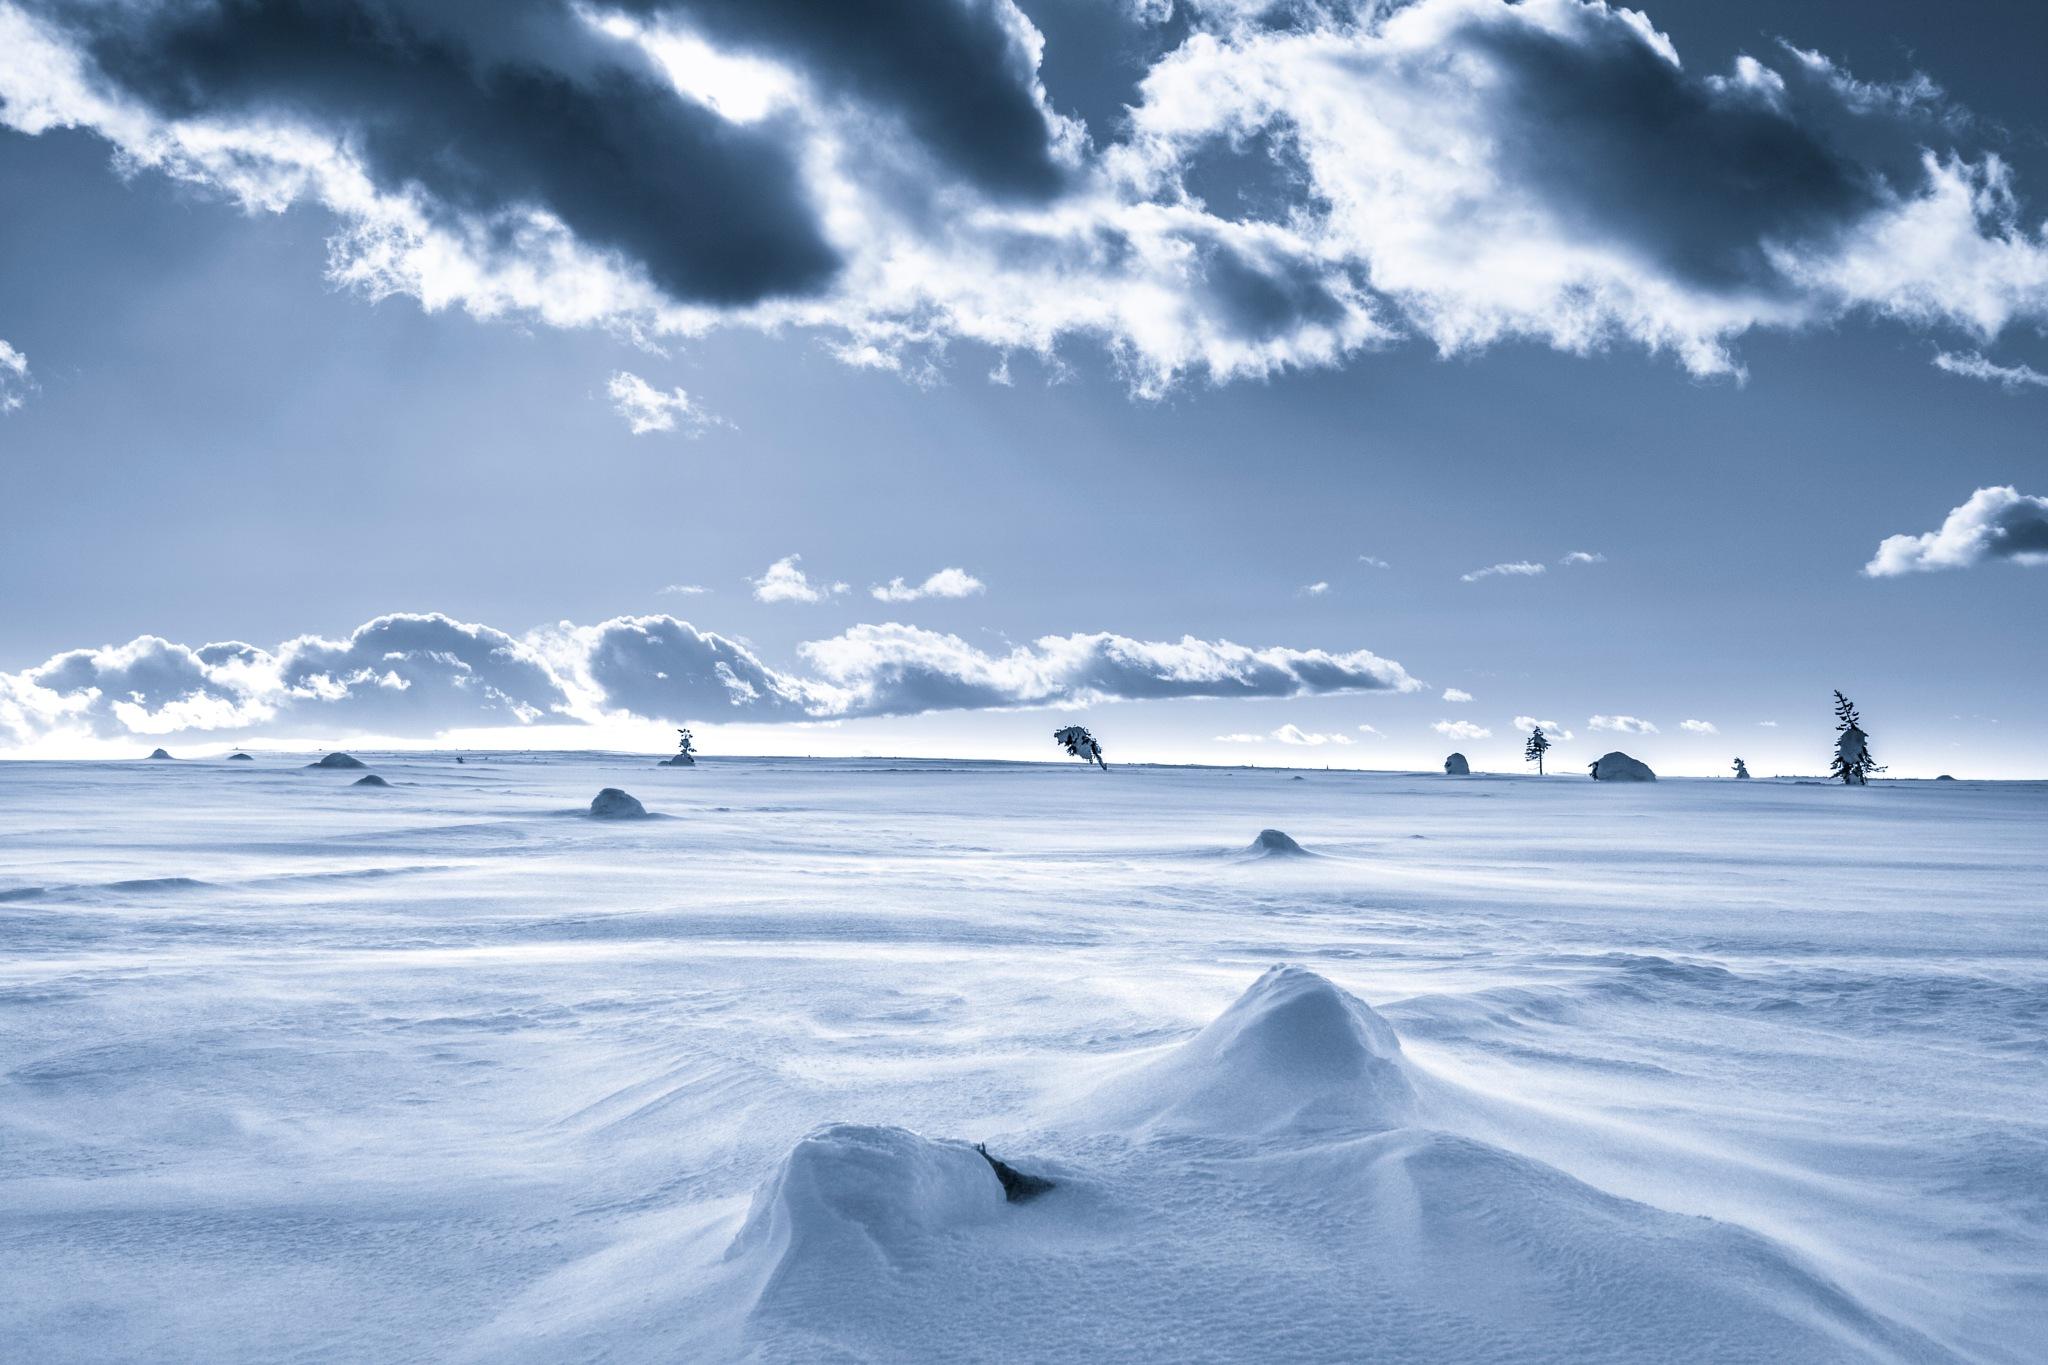 Winter landscape by Mattias Carlsson